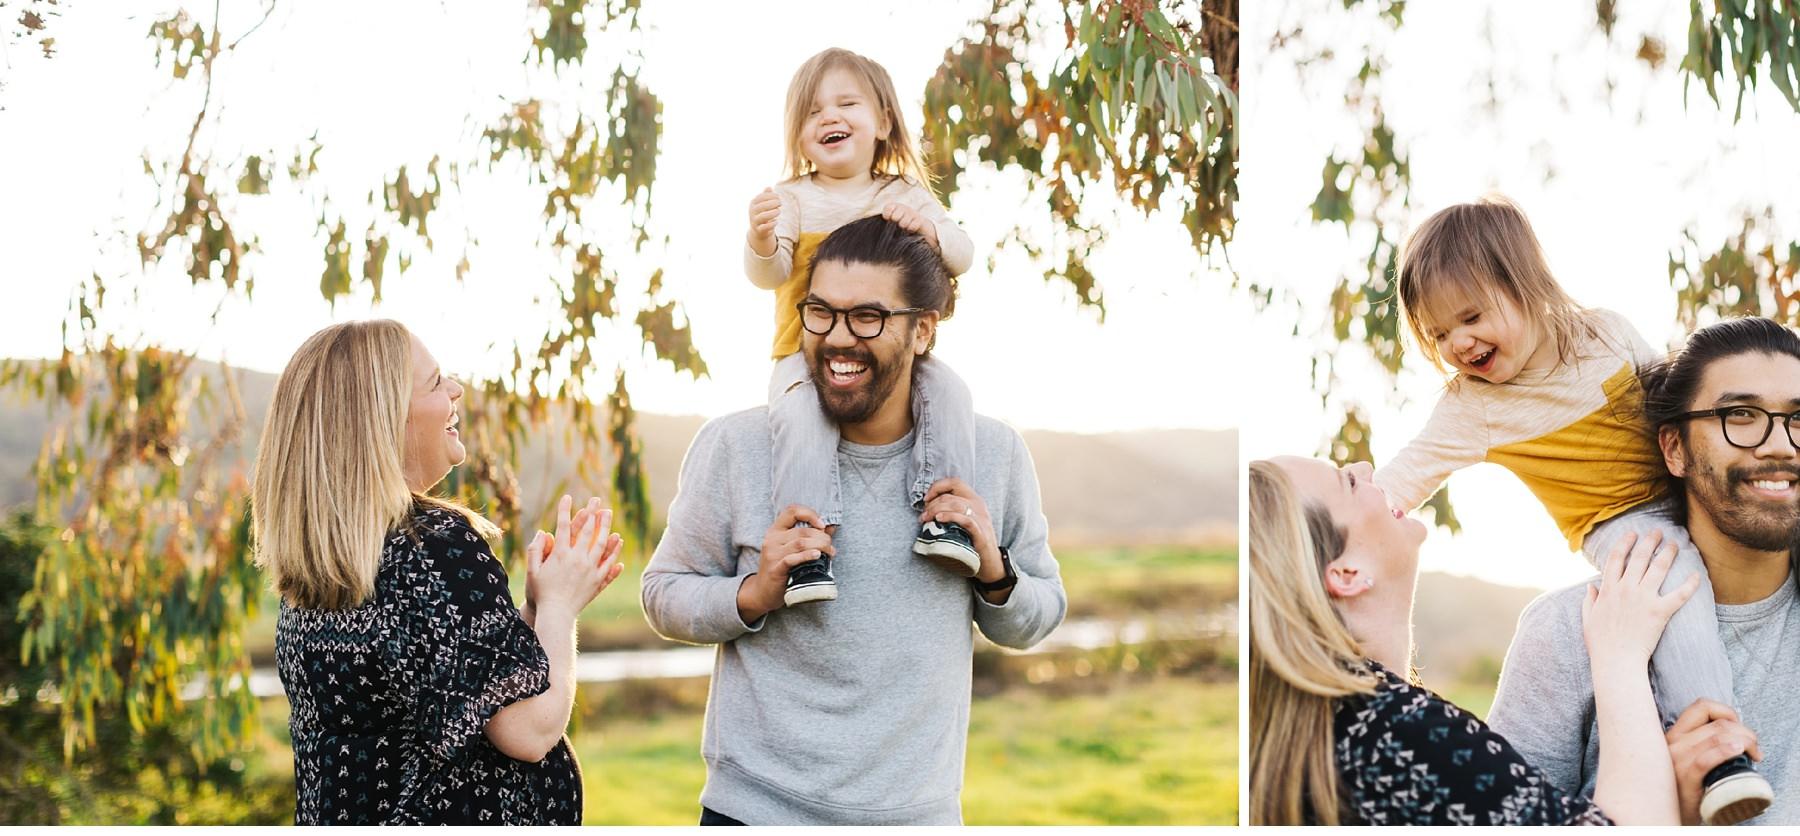 Oh, Honestly Photography - SF Bay Area Family Photoshoot_0004.jpg